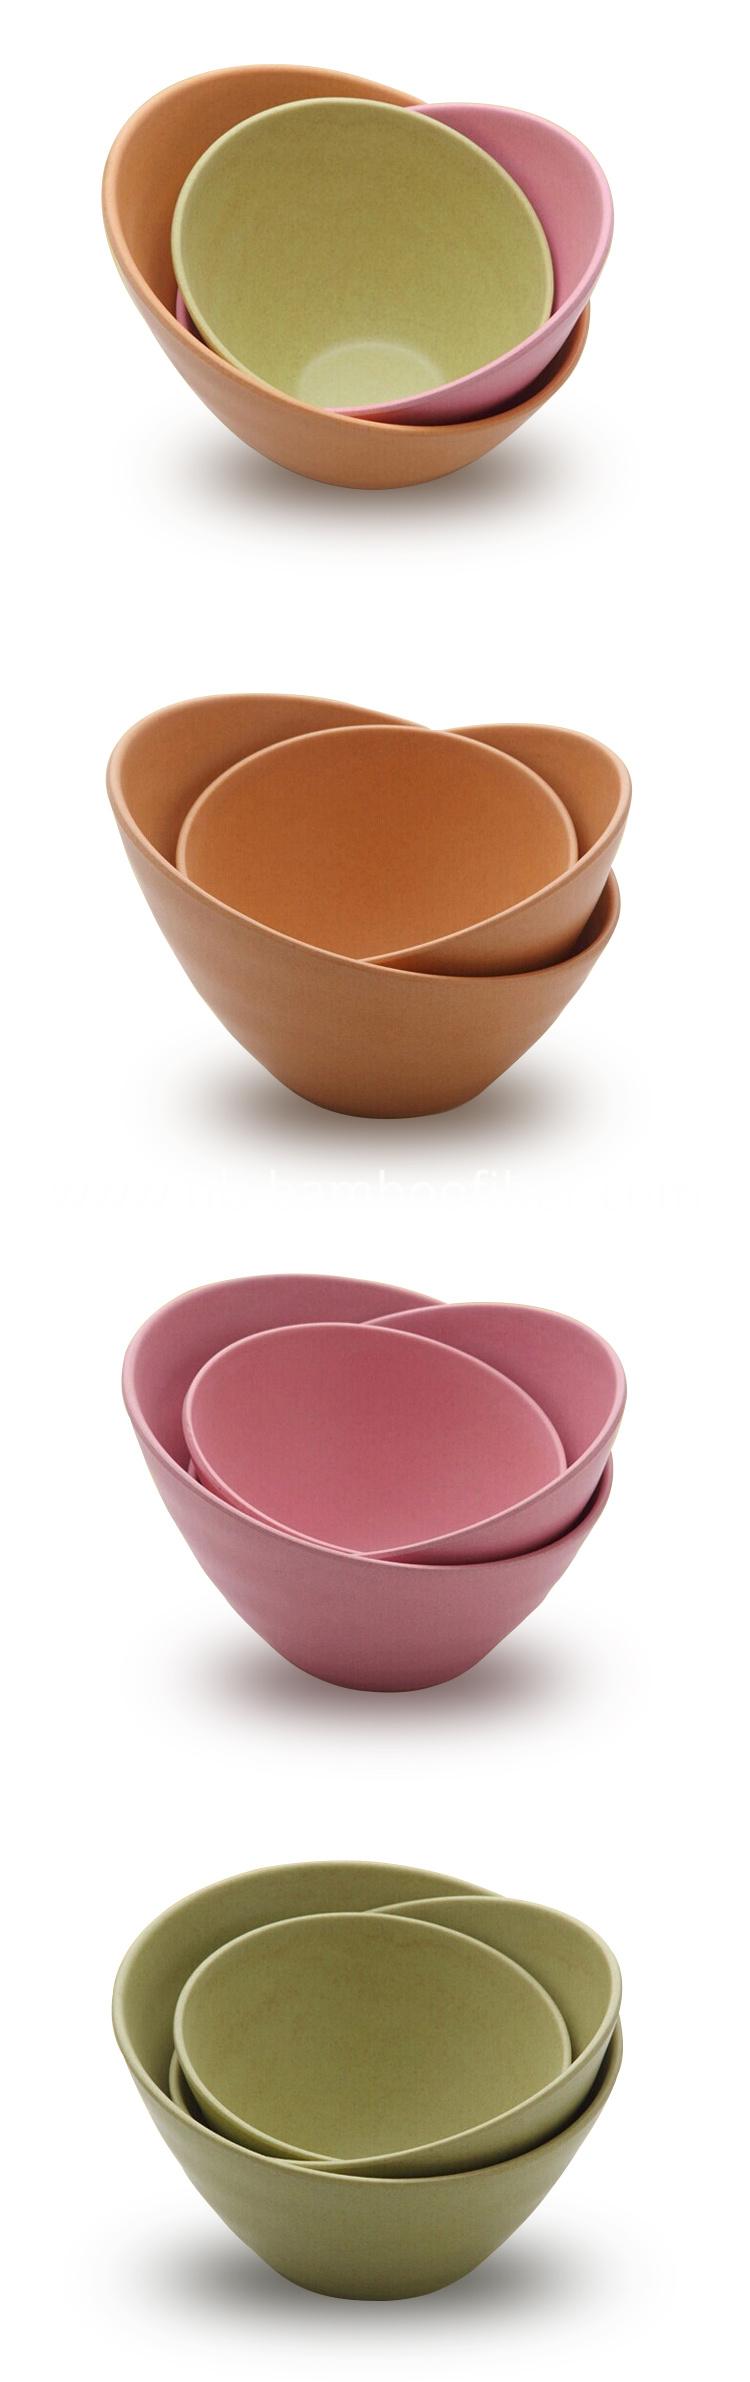 irregular bowl